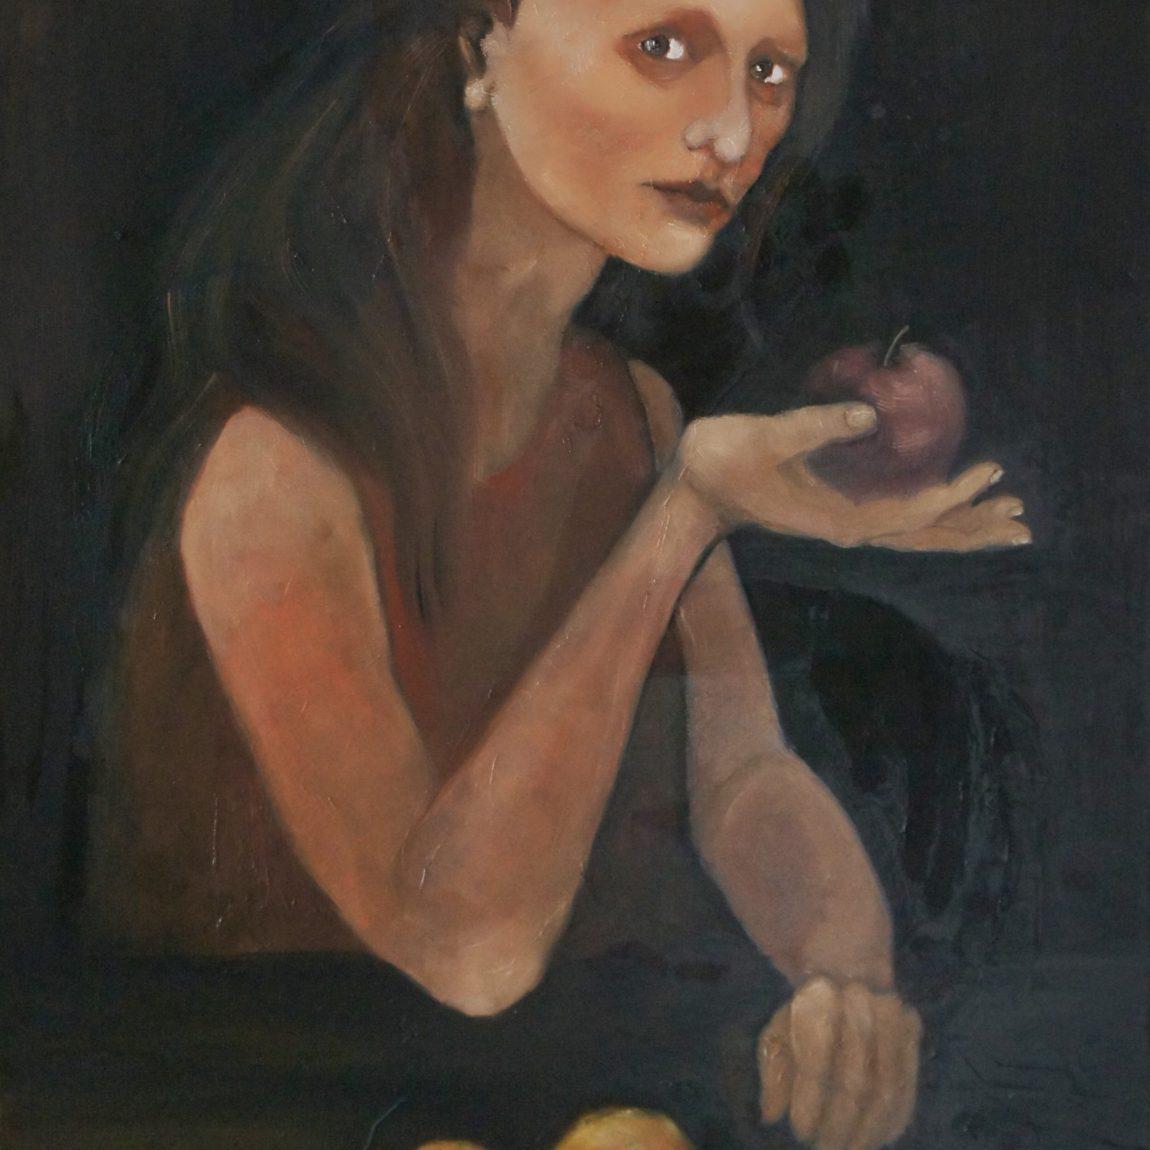 PINAR TÜRE GÜRSOY -  Eser Adı: Lilith  Teknik: Tuval Üzeri Yağlı Boya  Ölçü: 70 x 100 cm  Fiyat : 5.310 TL